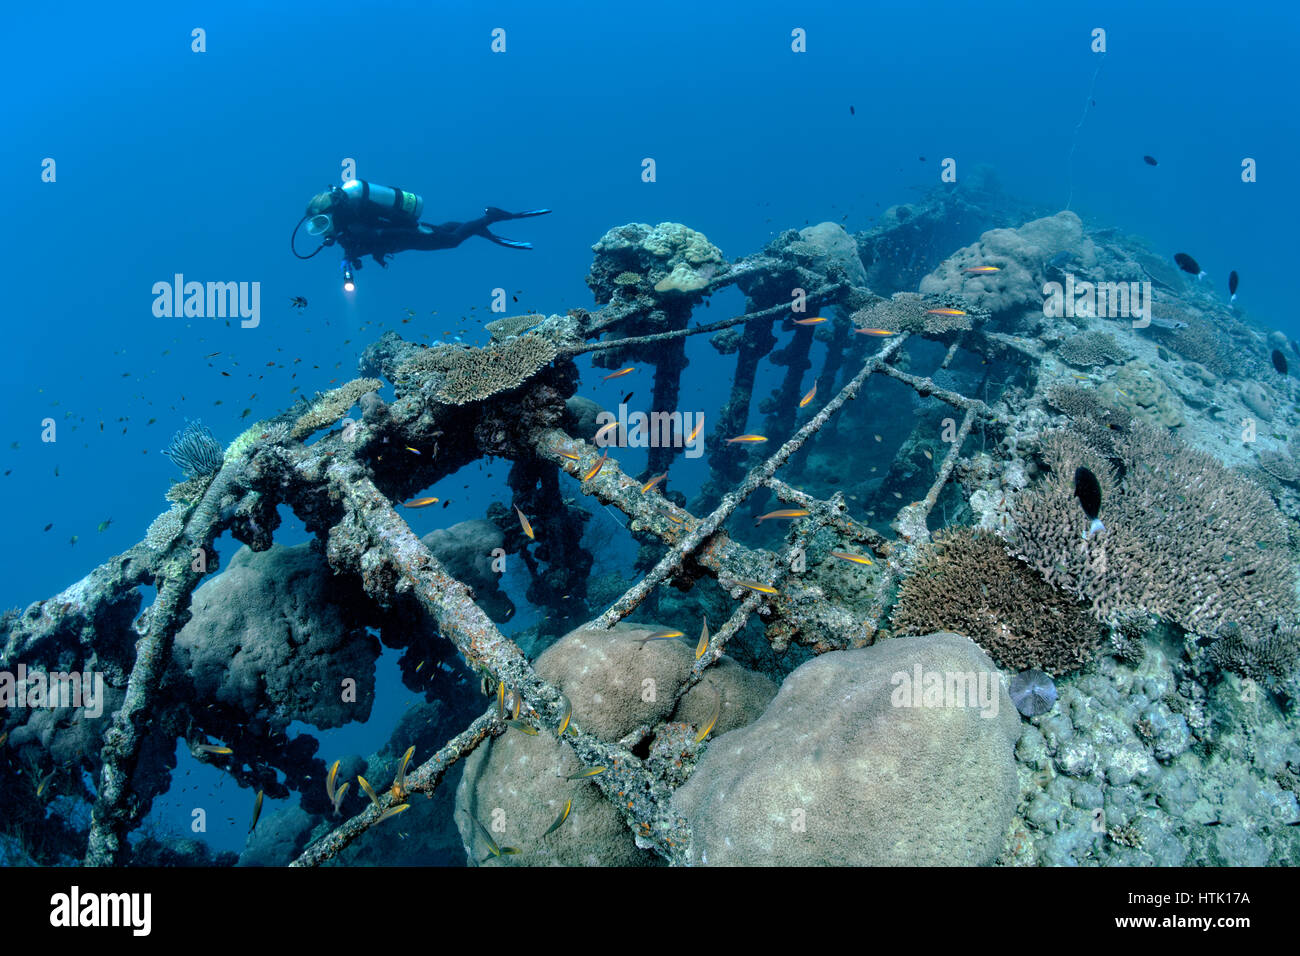 Diver near British Loyalty shipwreck, overgrown with corals, Addu Atoll also Senu Atoll, Indian Ocean, Maldives - Stock Image